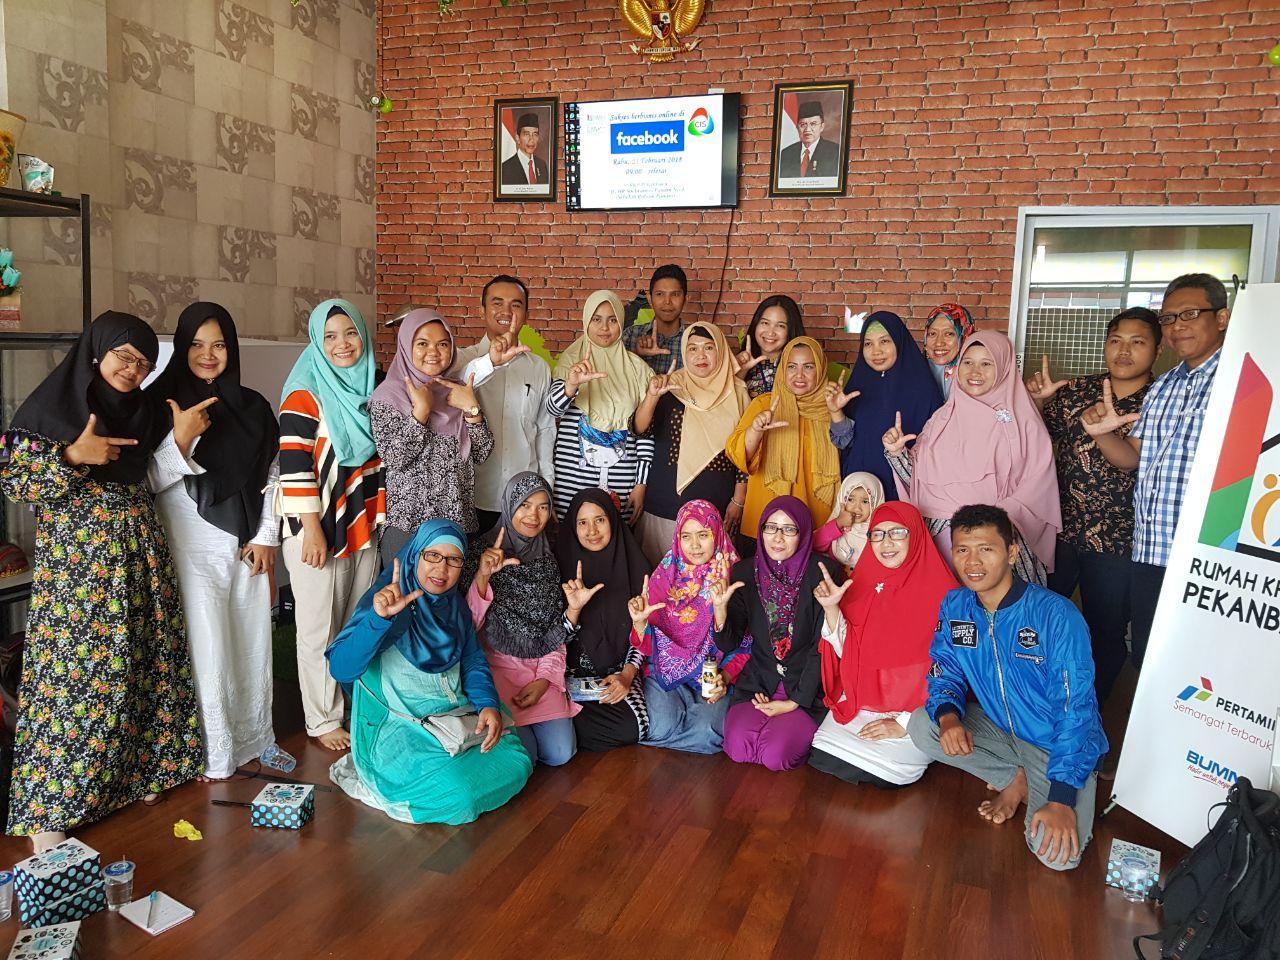 Kedai Ukm Produk Bumn Batik Full Tulis Katun Primiss Pacu Kinerja Umkm Rkb Pertamina Pekanbaru Gelar Pelatihan E Commerce